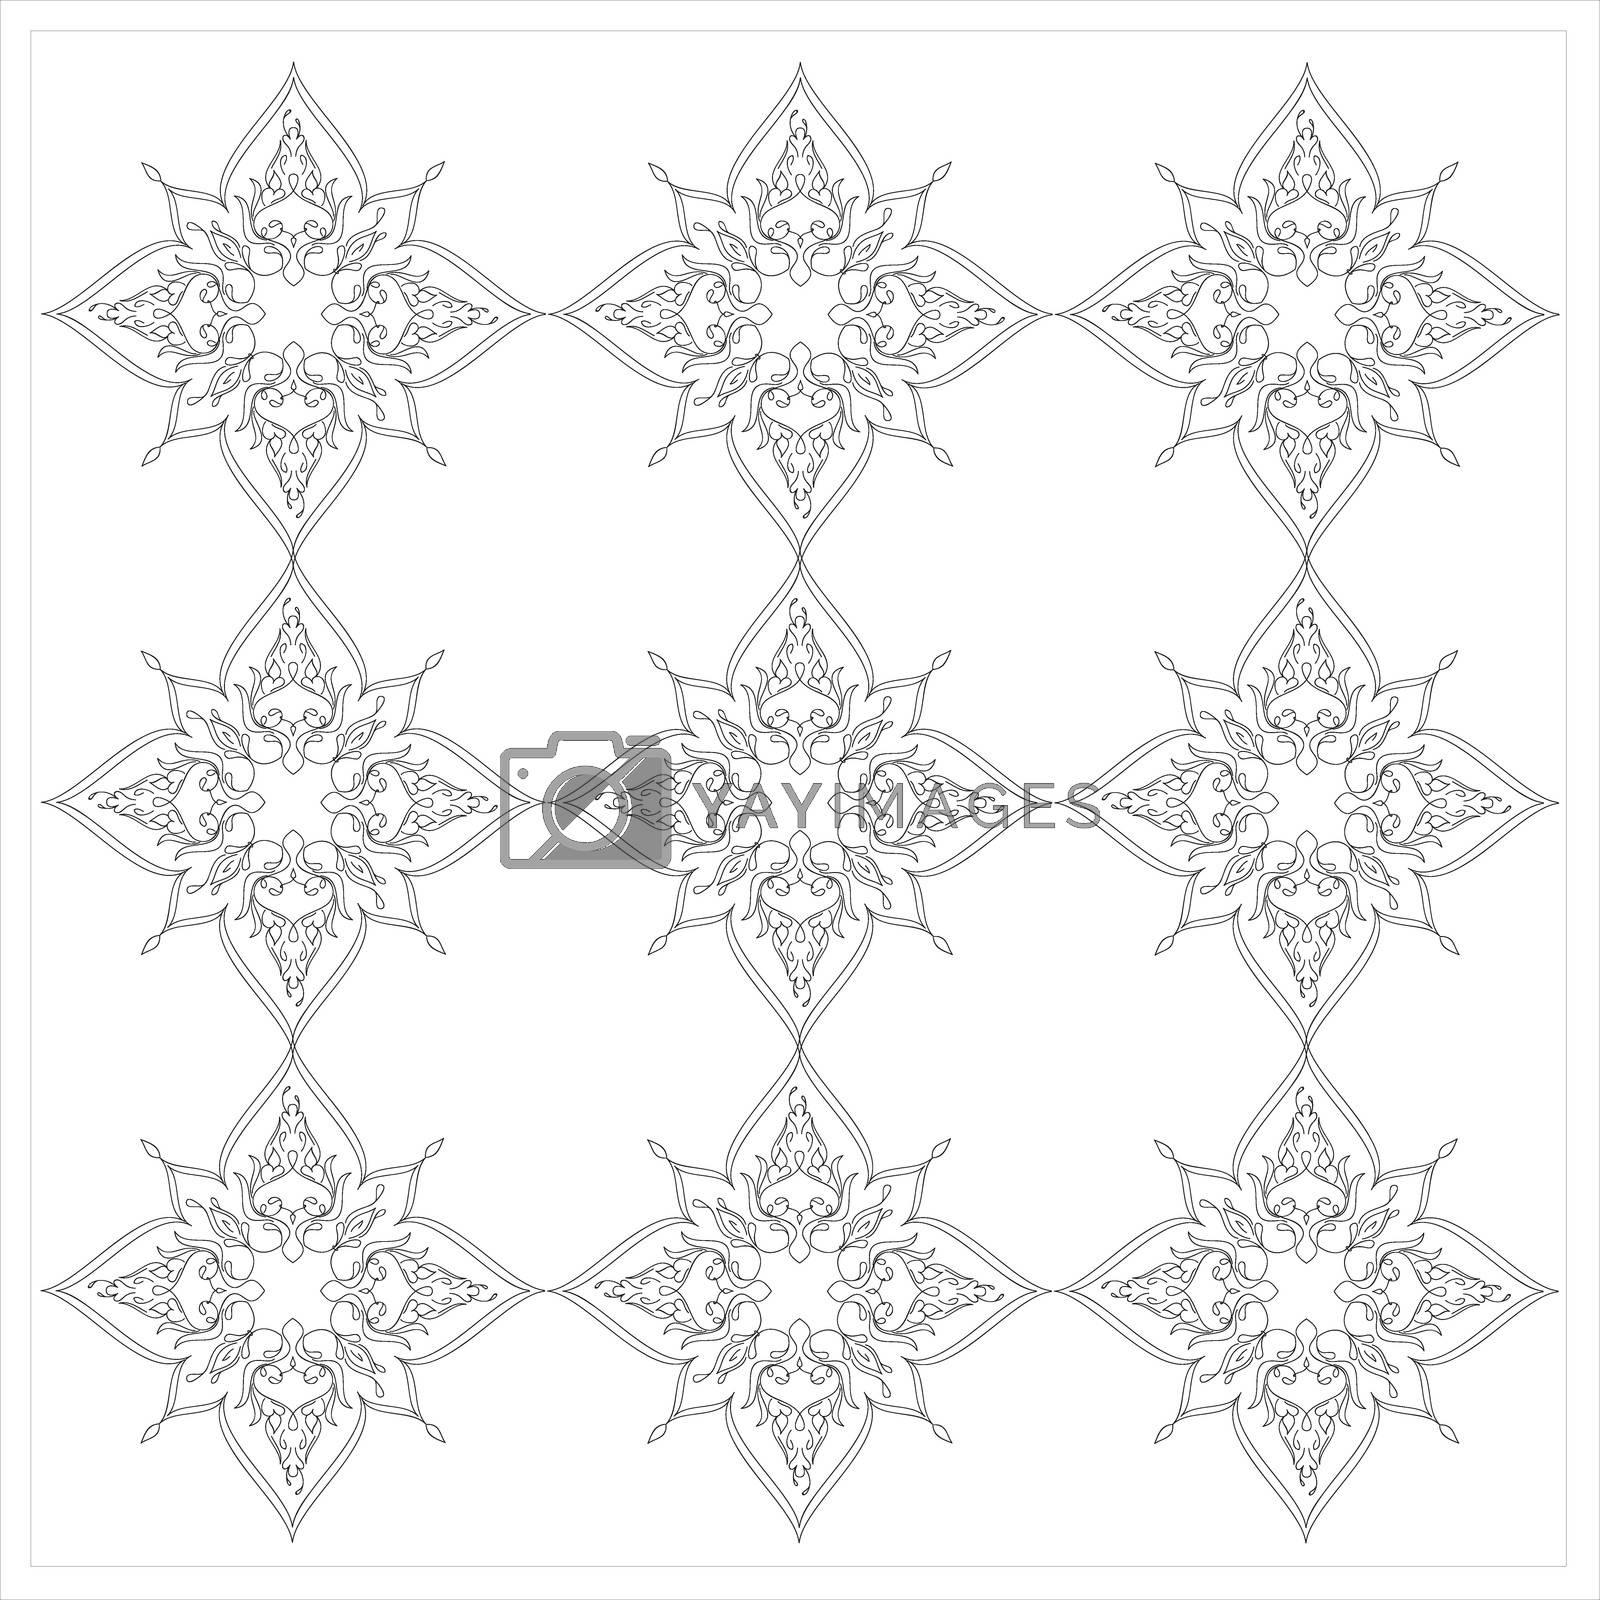 Royalty free image of Ottoman Tile Art With Nine Islamic Element by mturhanlar